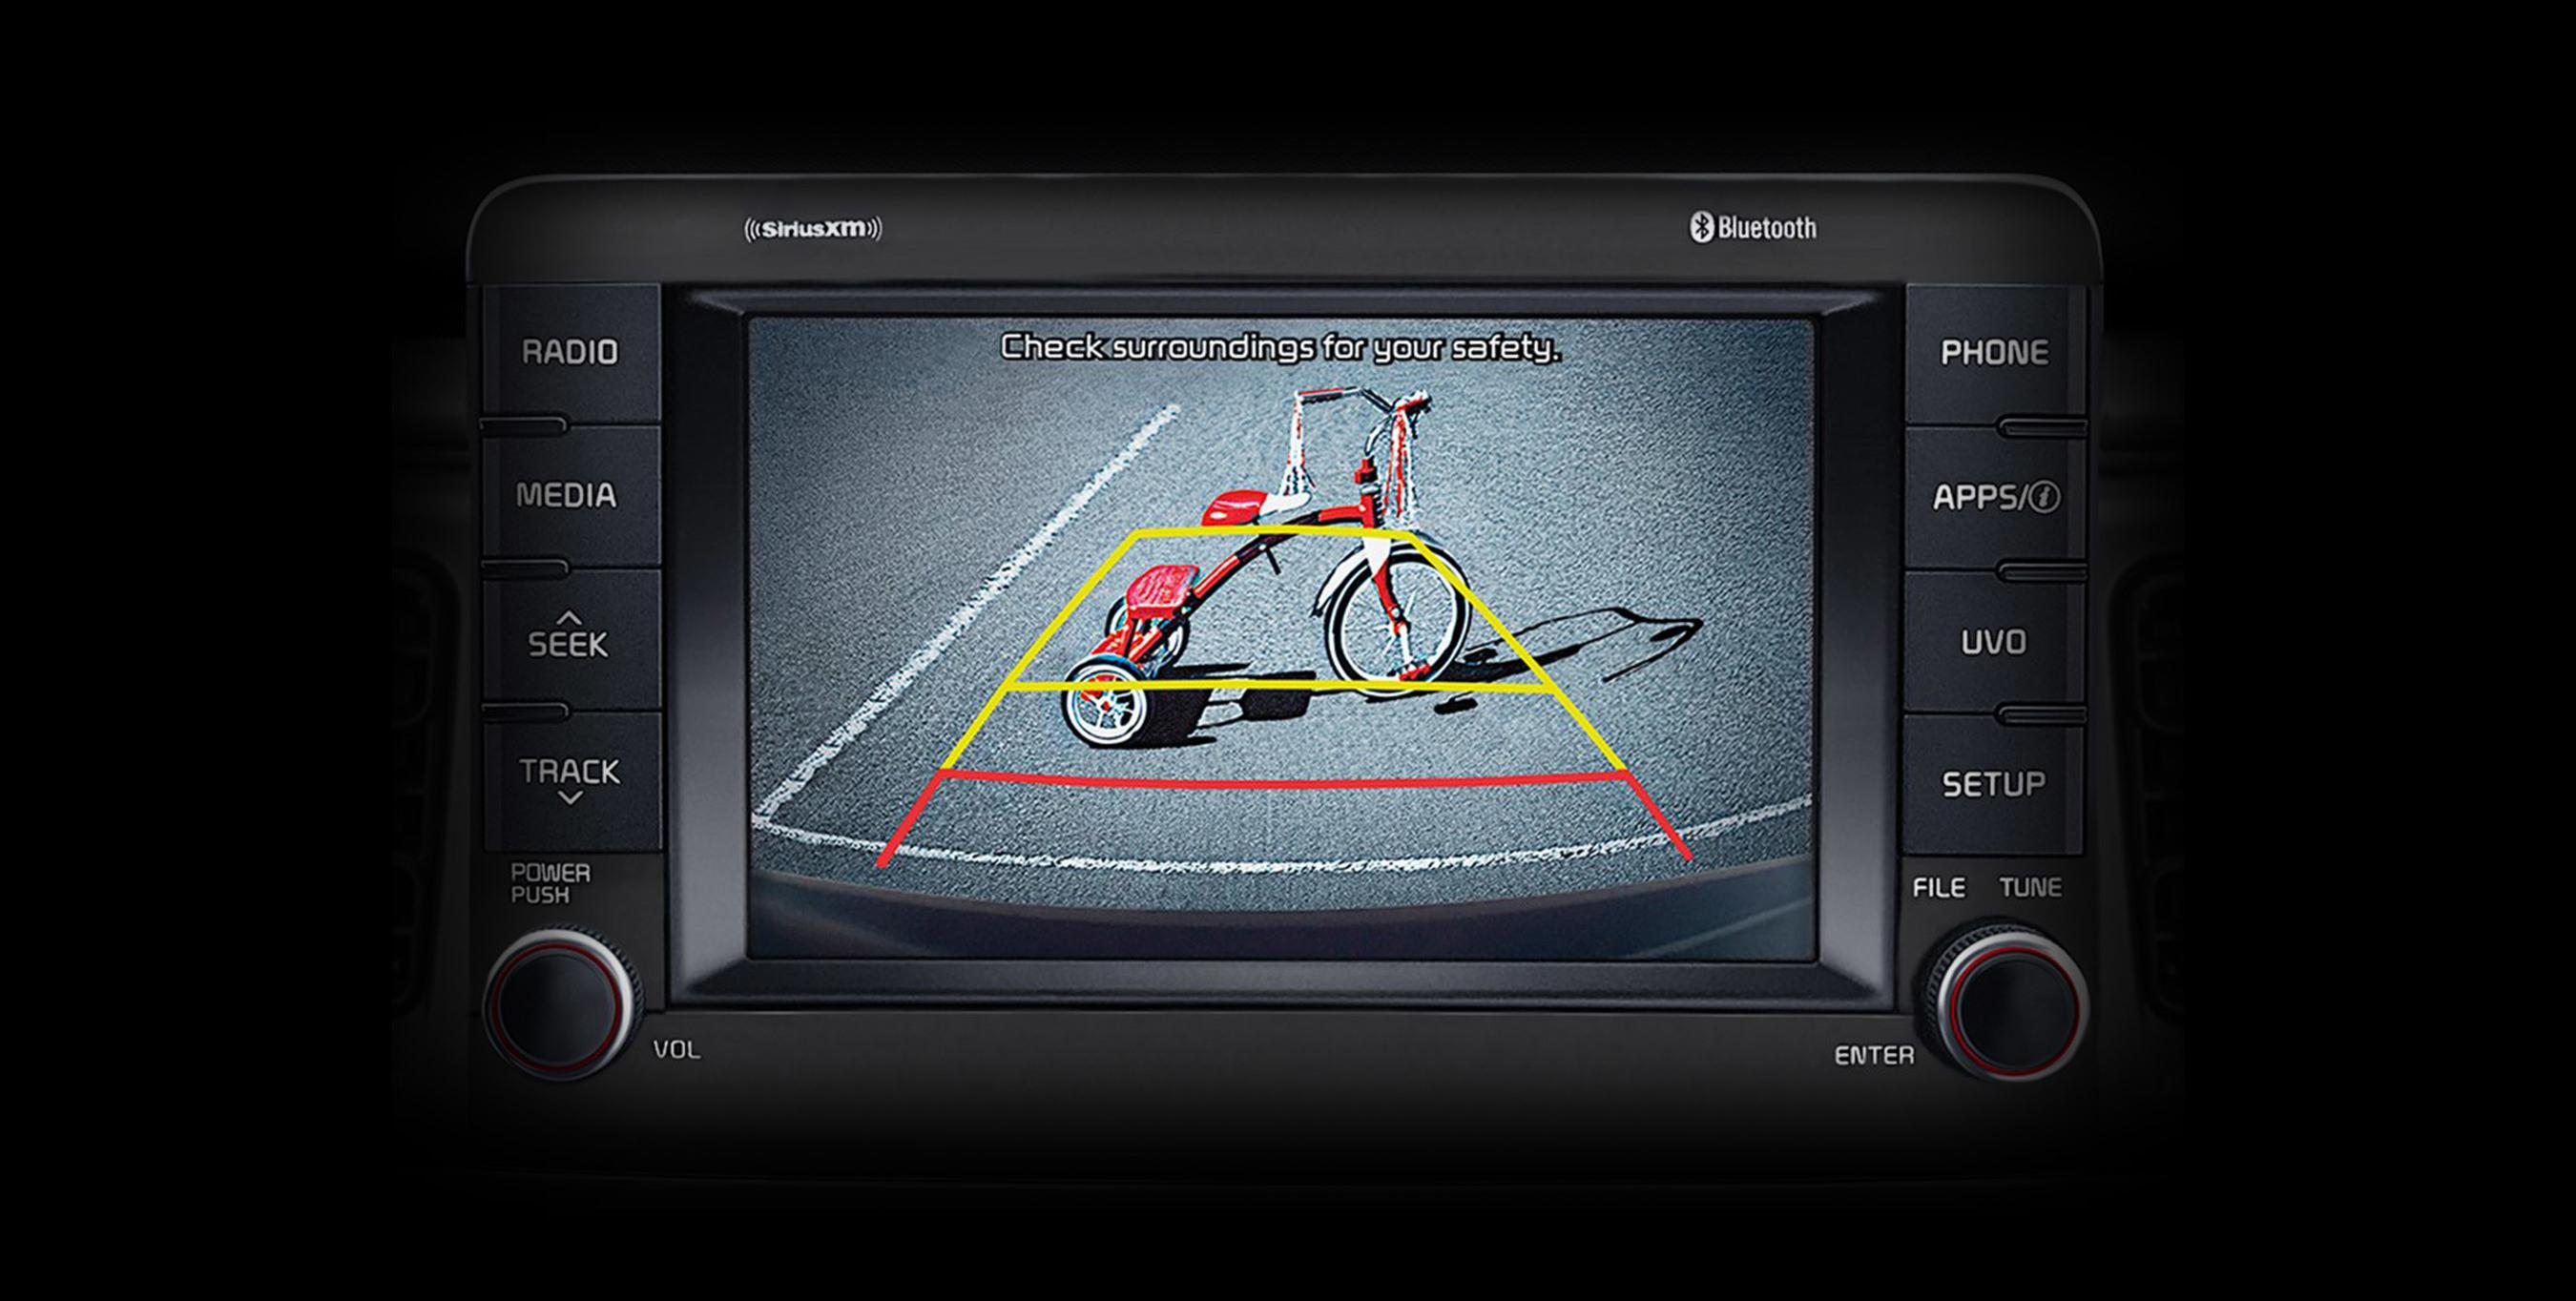 2020 Kia Rio Rear-Camera Display